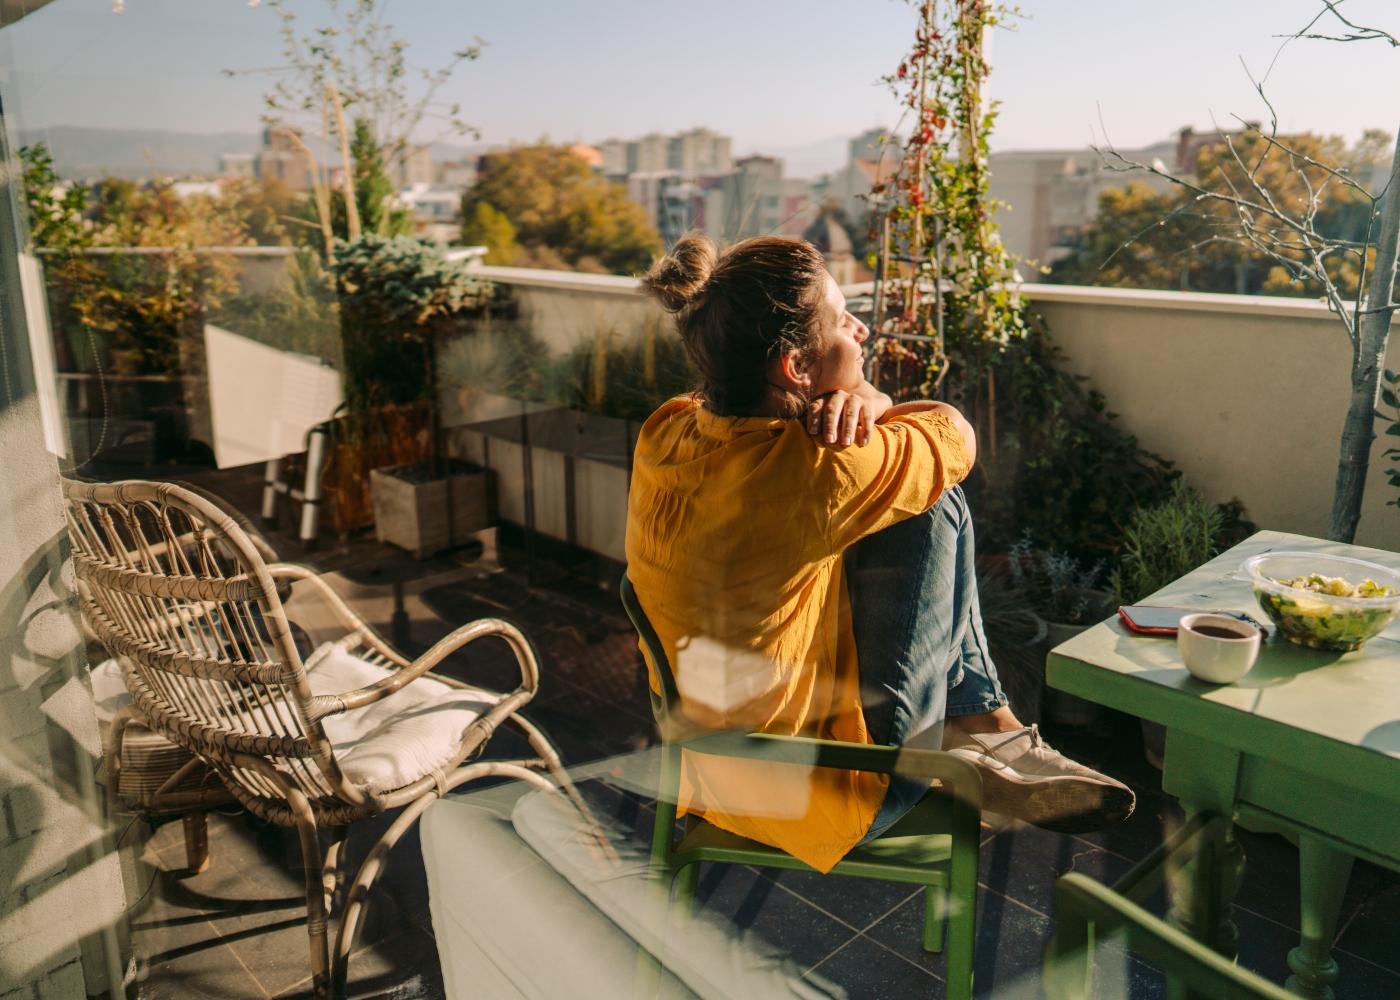 Mulher a almoçar na varanda de casa